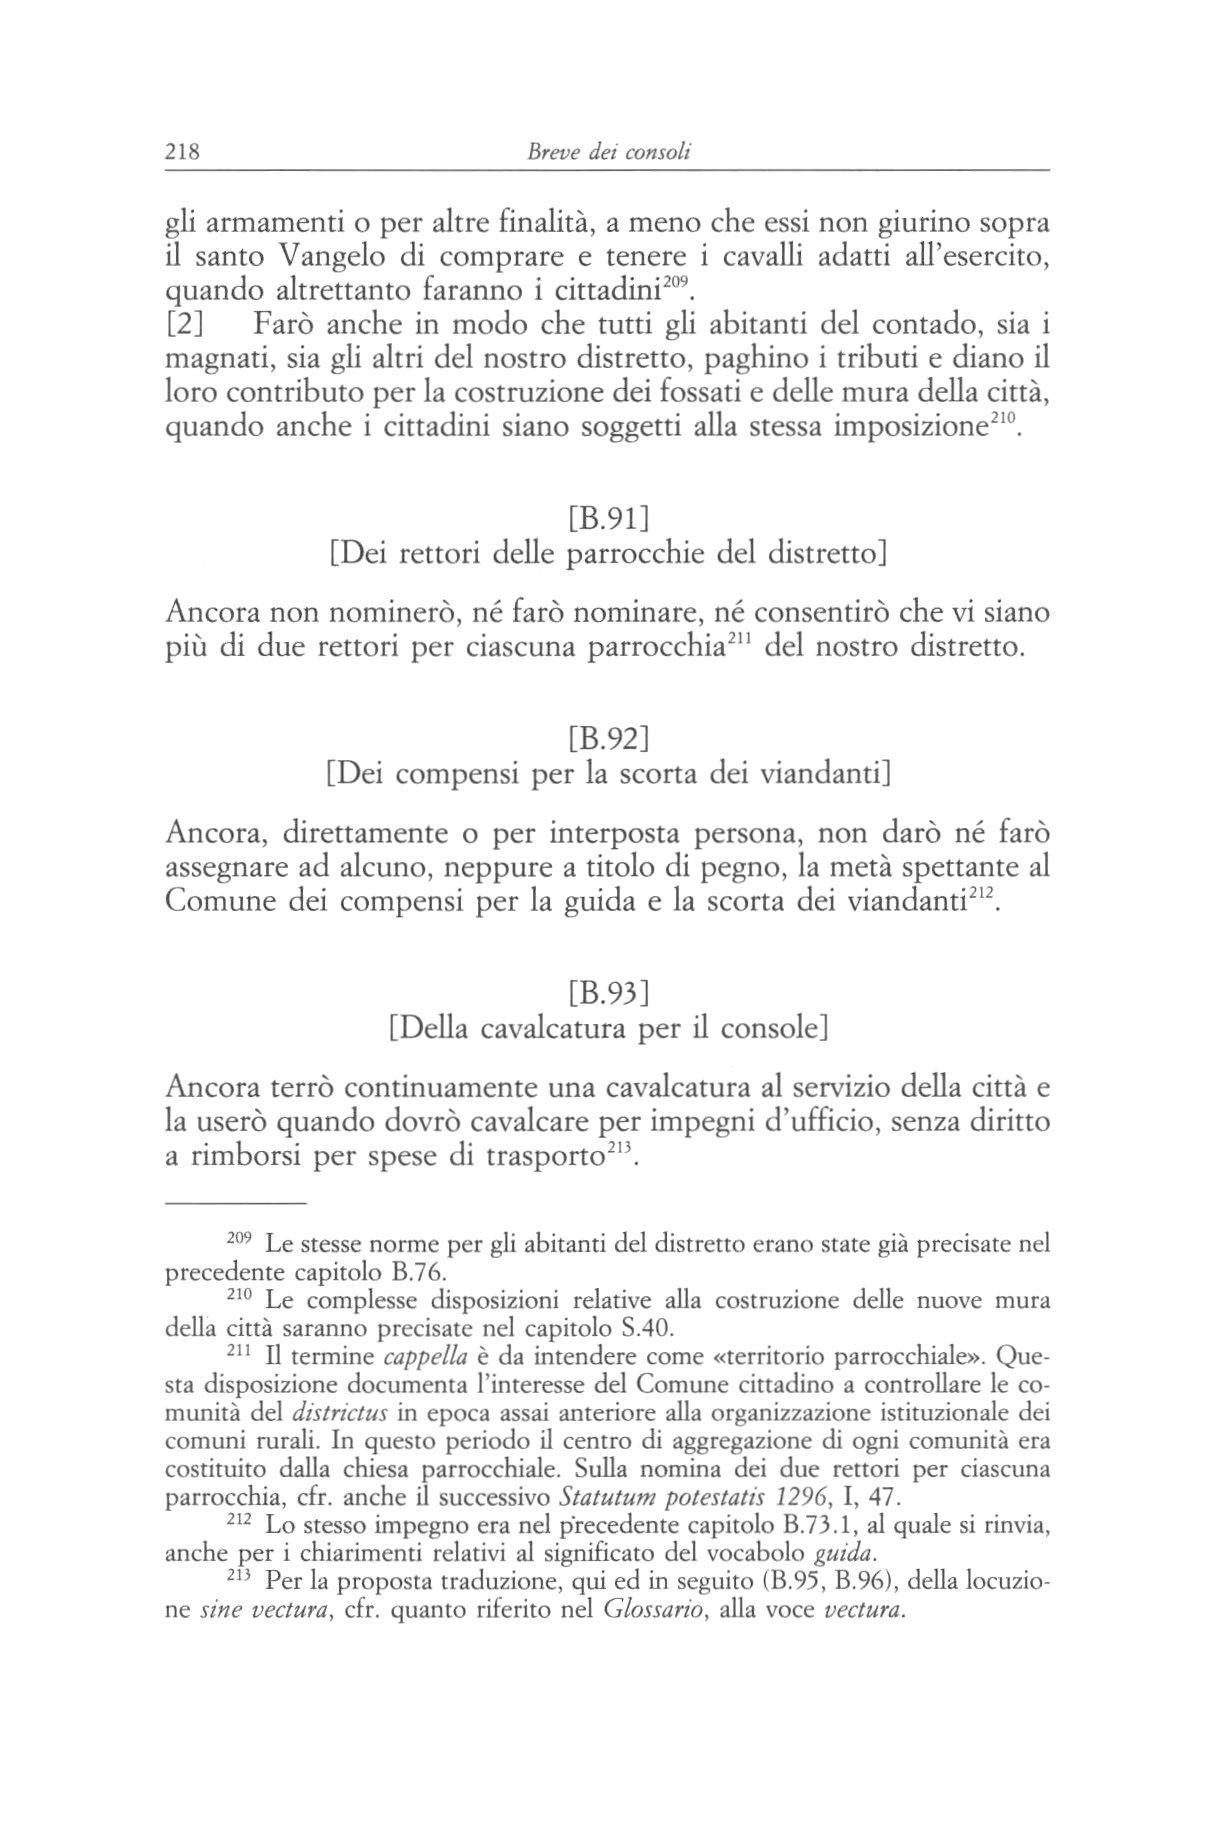 statuti pistoiesi del sec.XII 0218.jpg